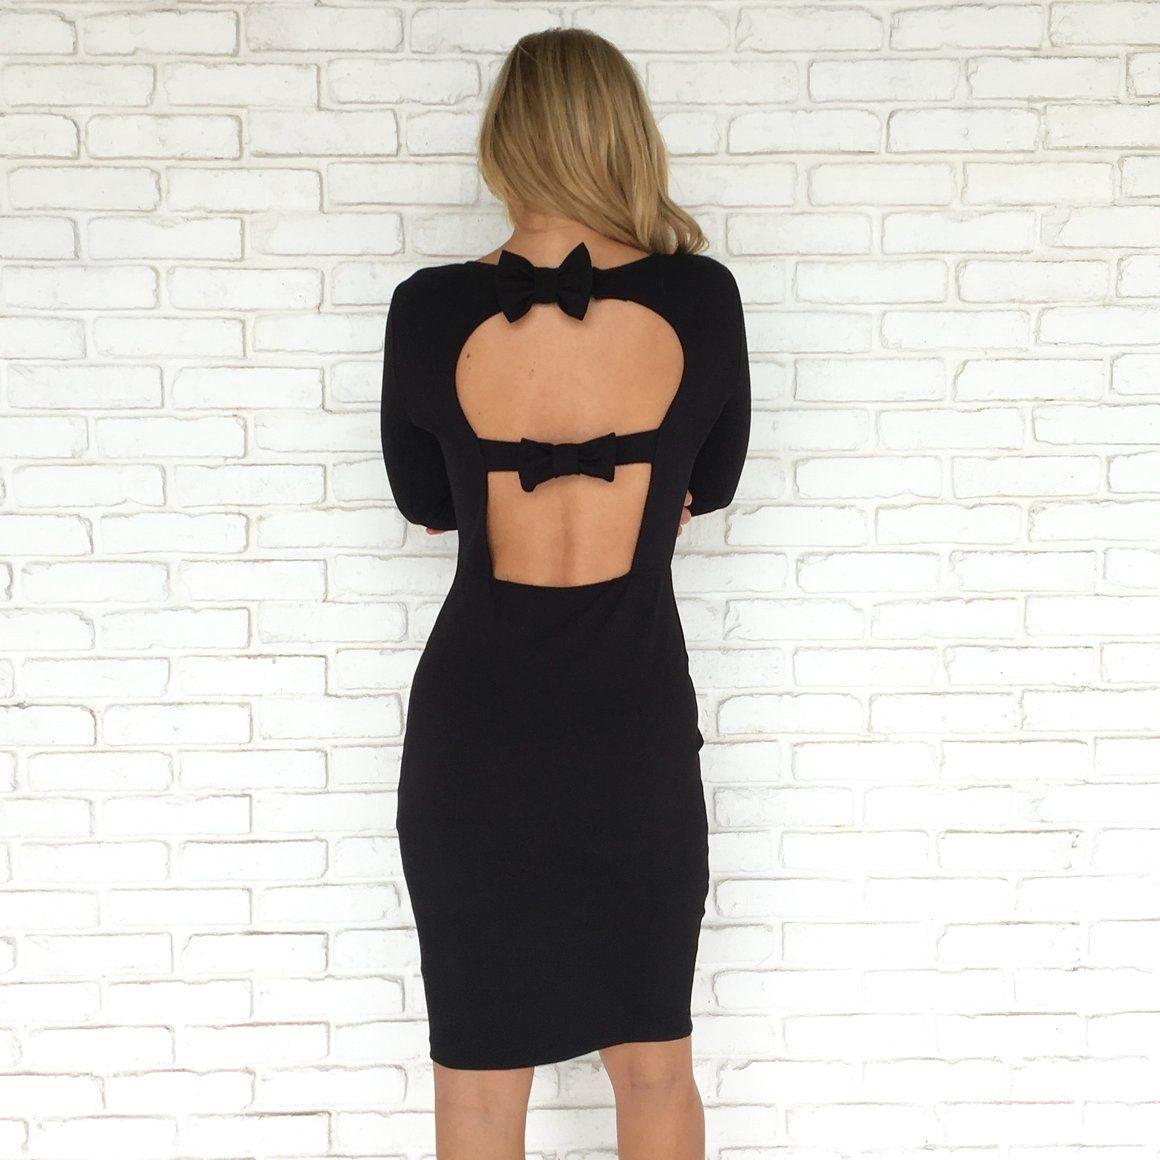 Sophisticated Little Bow Back Dress In Black Girls Night Out Bow Back Dresses Little Black Dress [ 1160 x 1160 Pixel ]